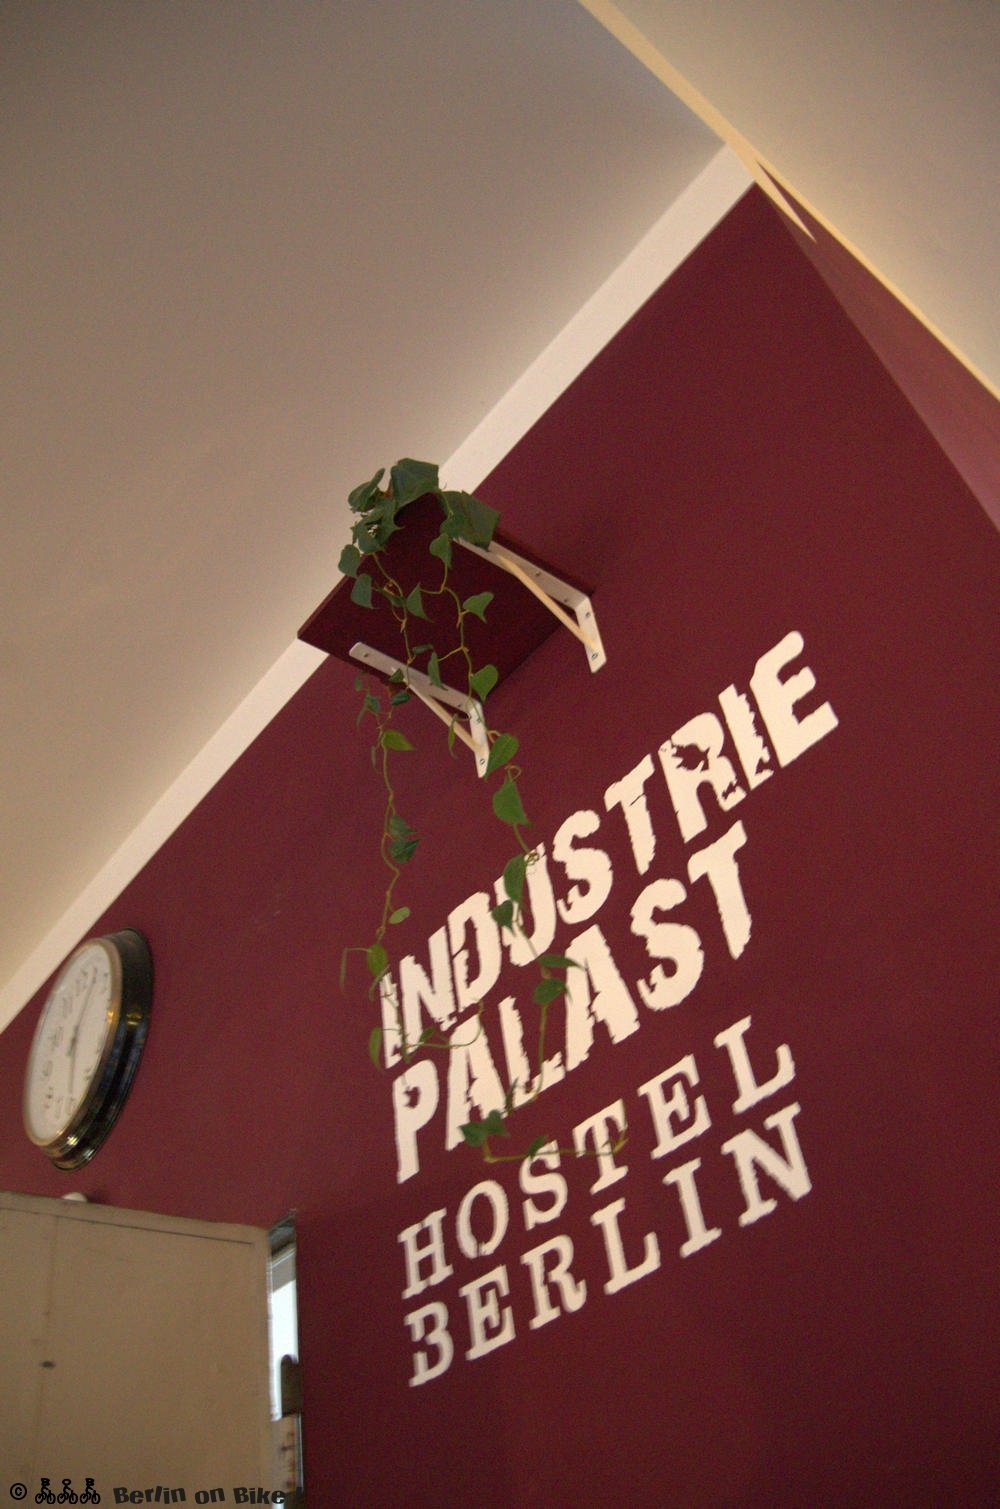 BoB-im-Industriepalast02